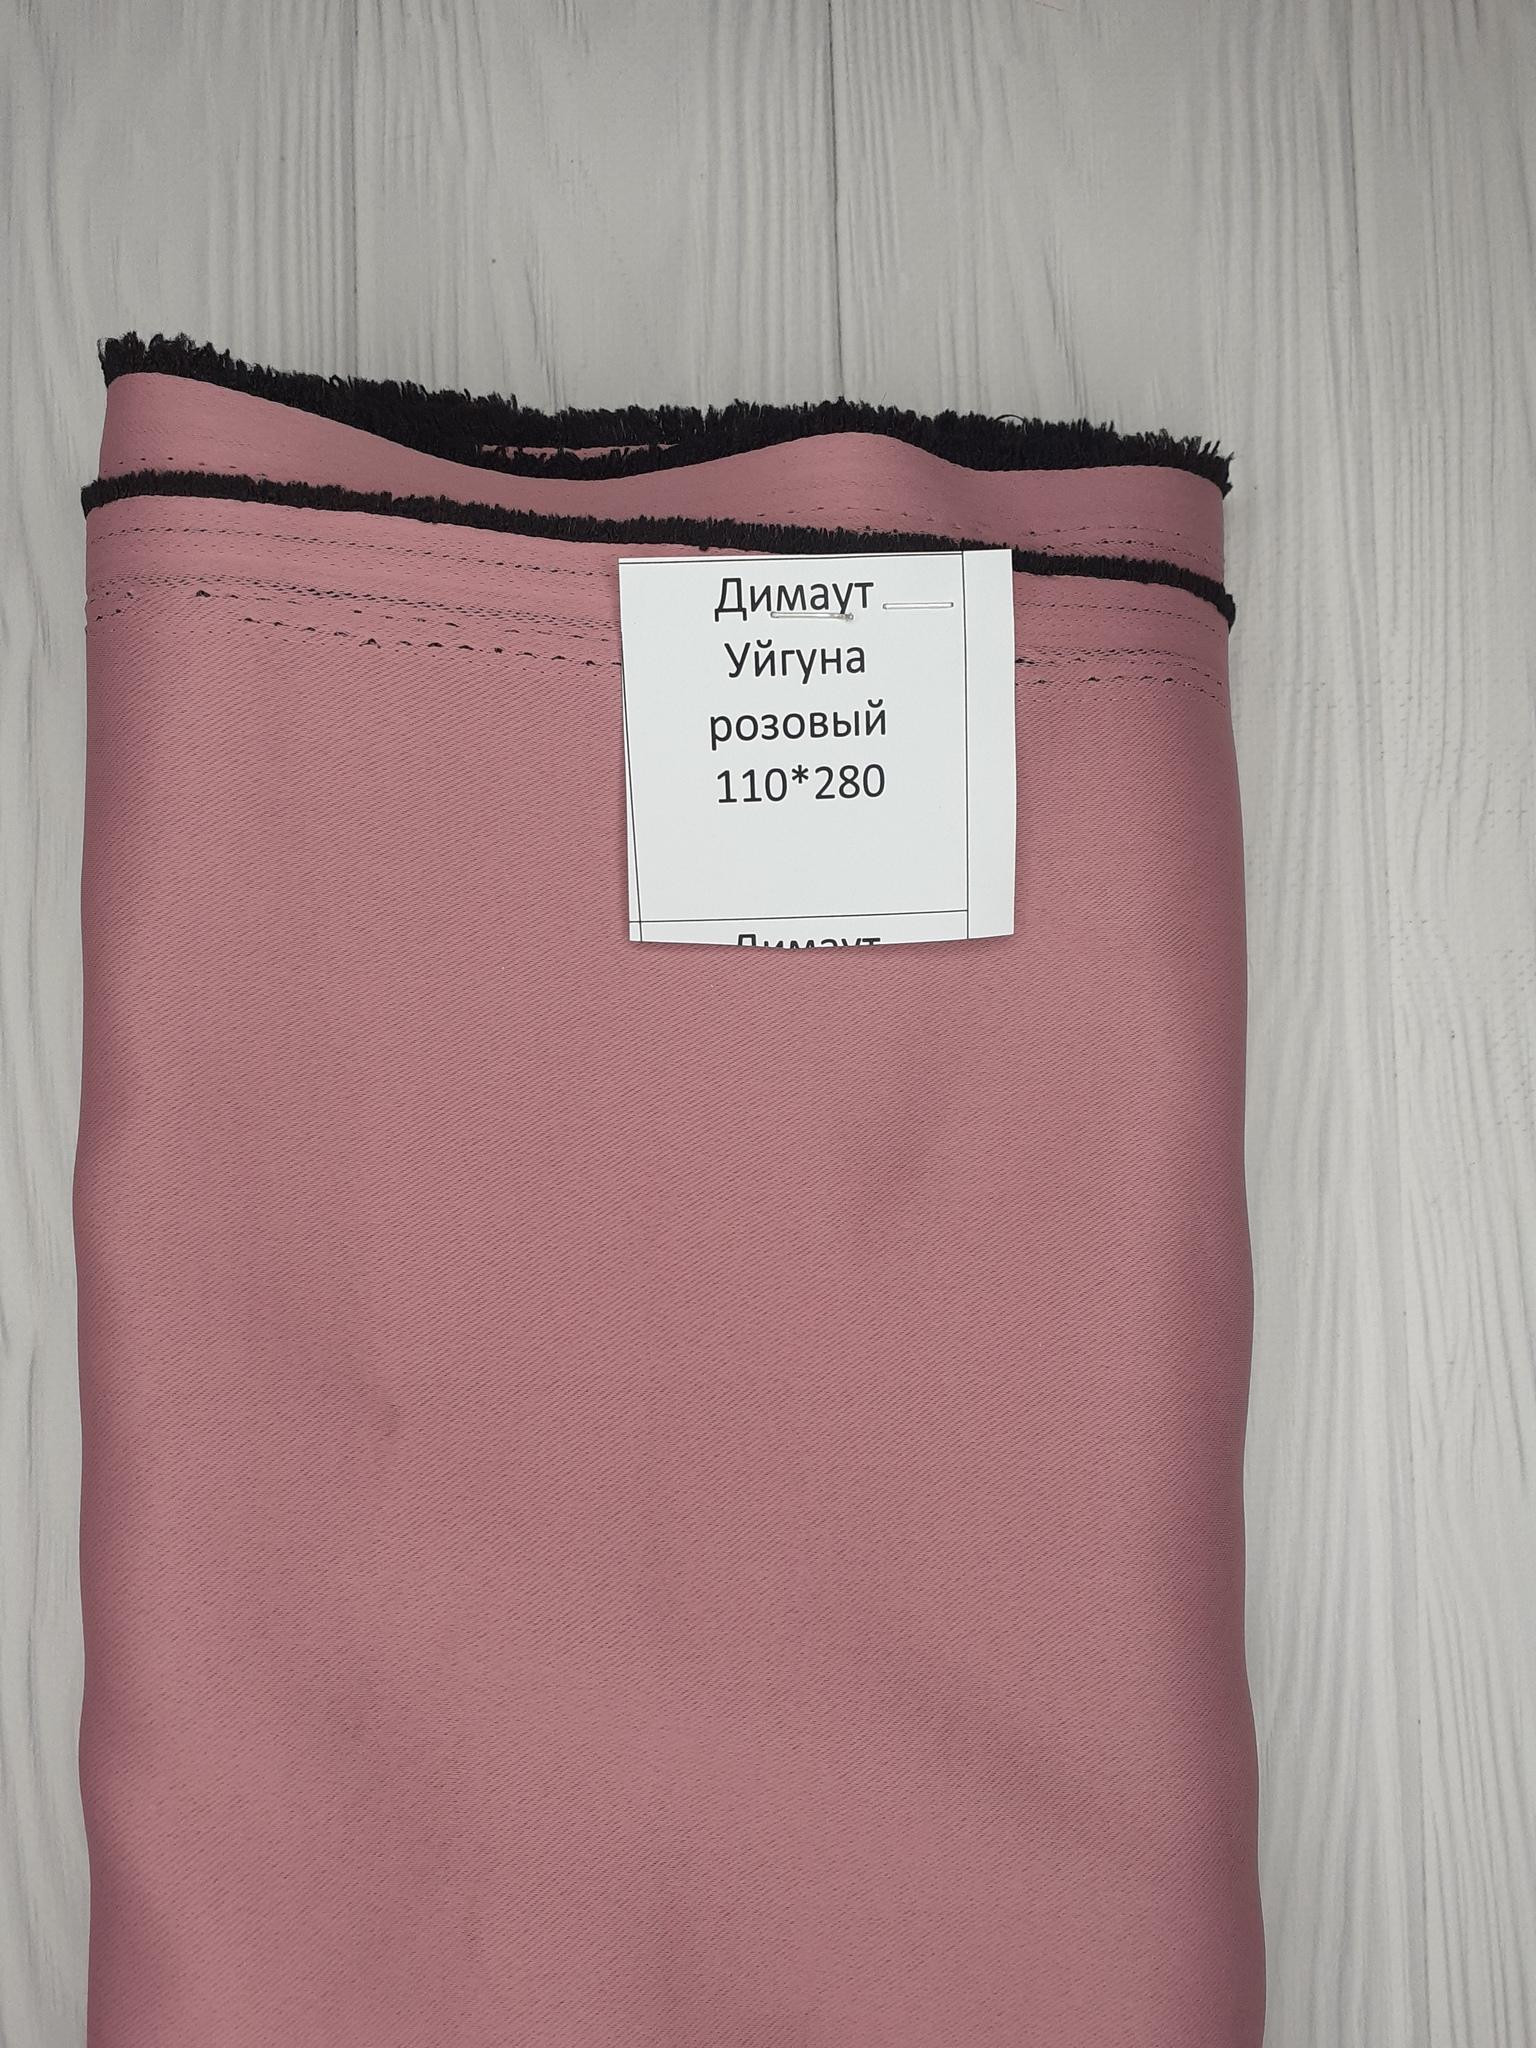 Димаут уйгуна розовый (лоскут)